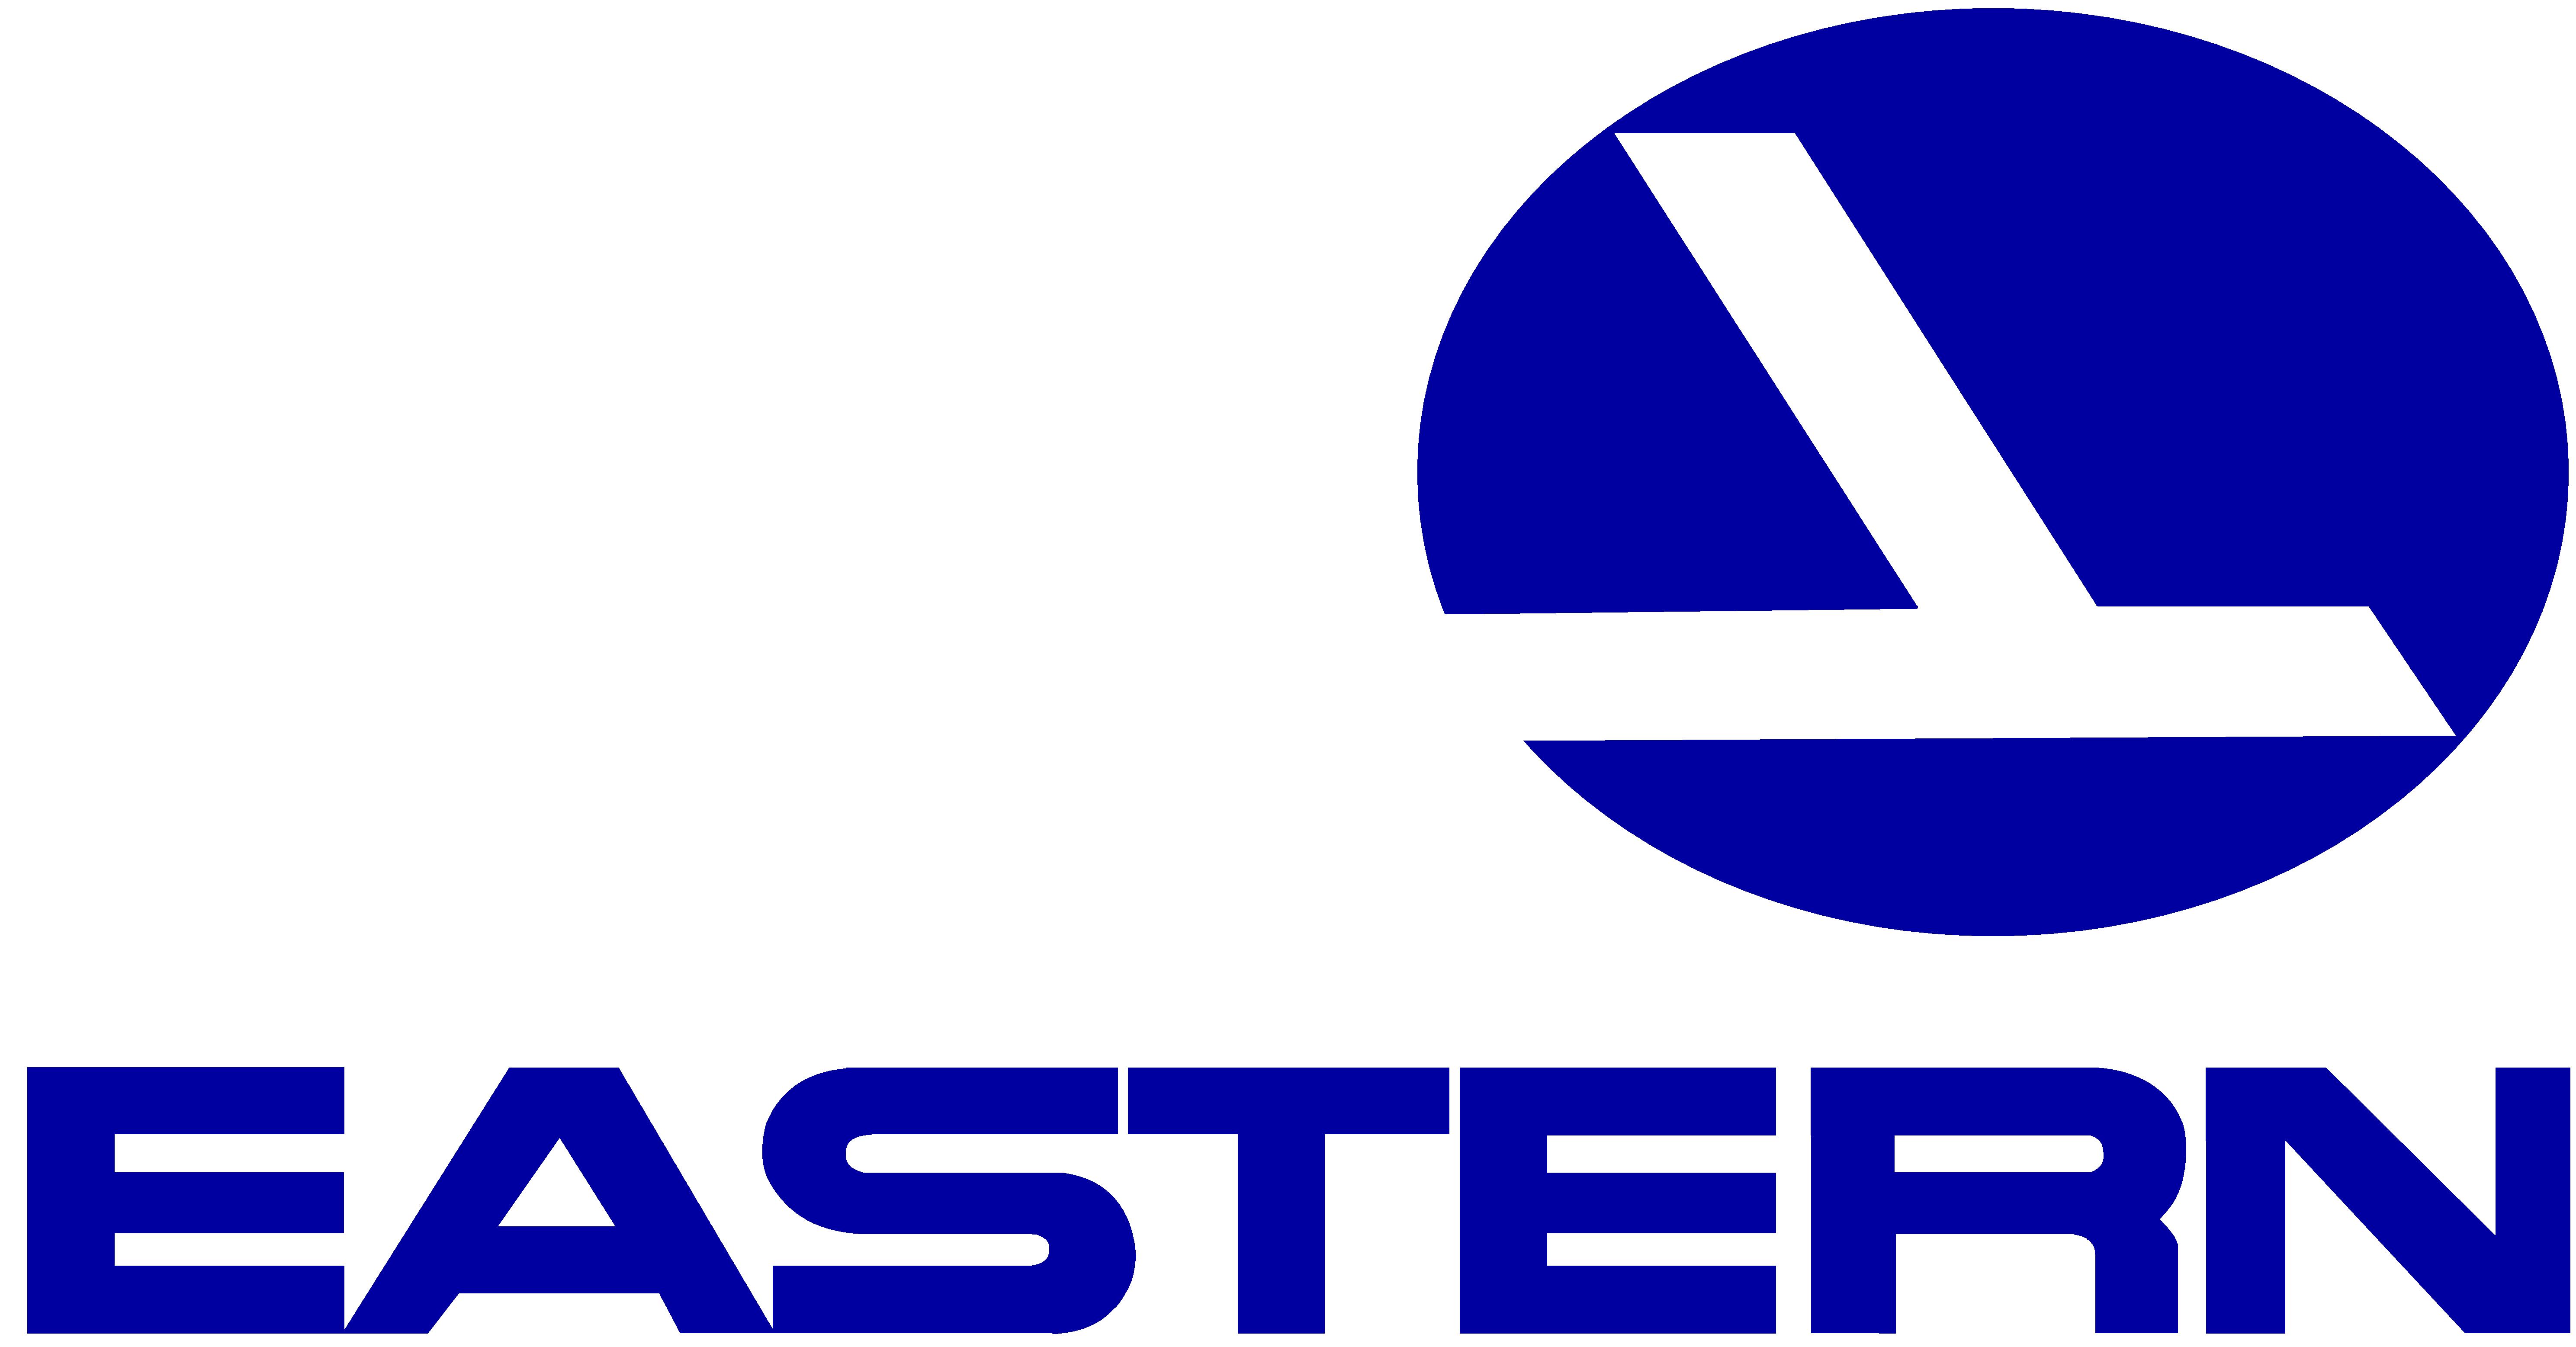 Eastern Logo Vector By Windytheplaneh On Deviantart